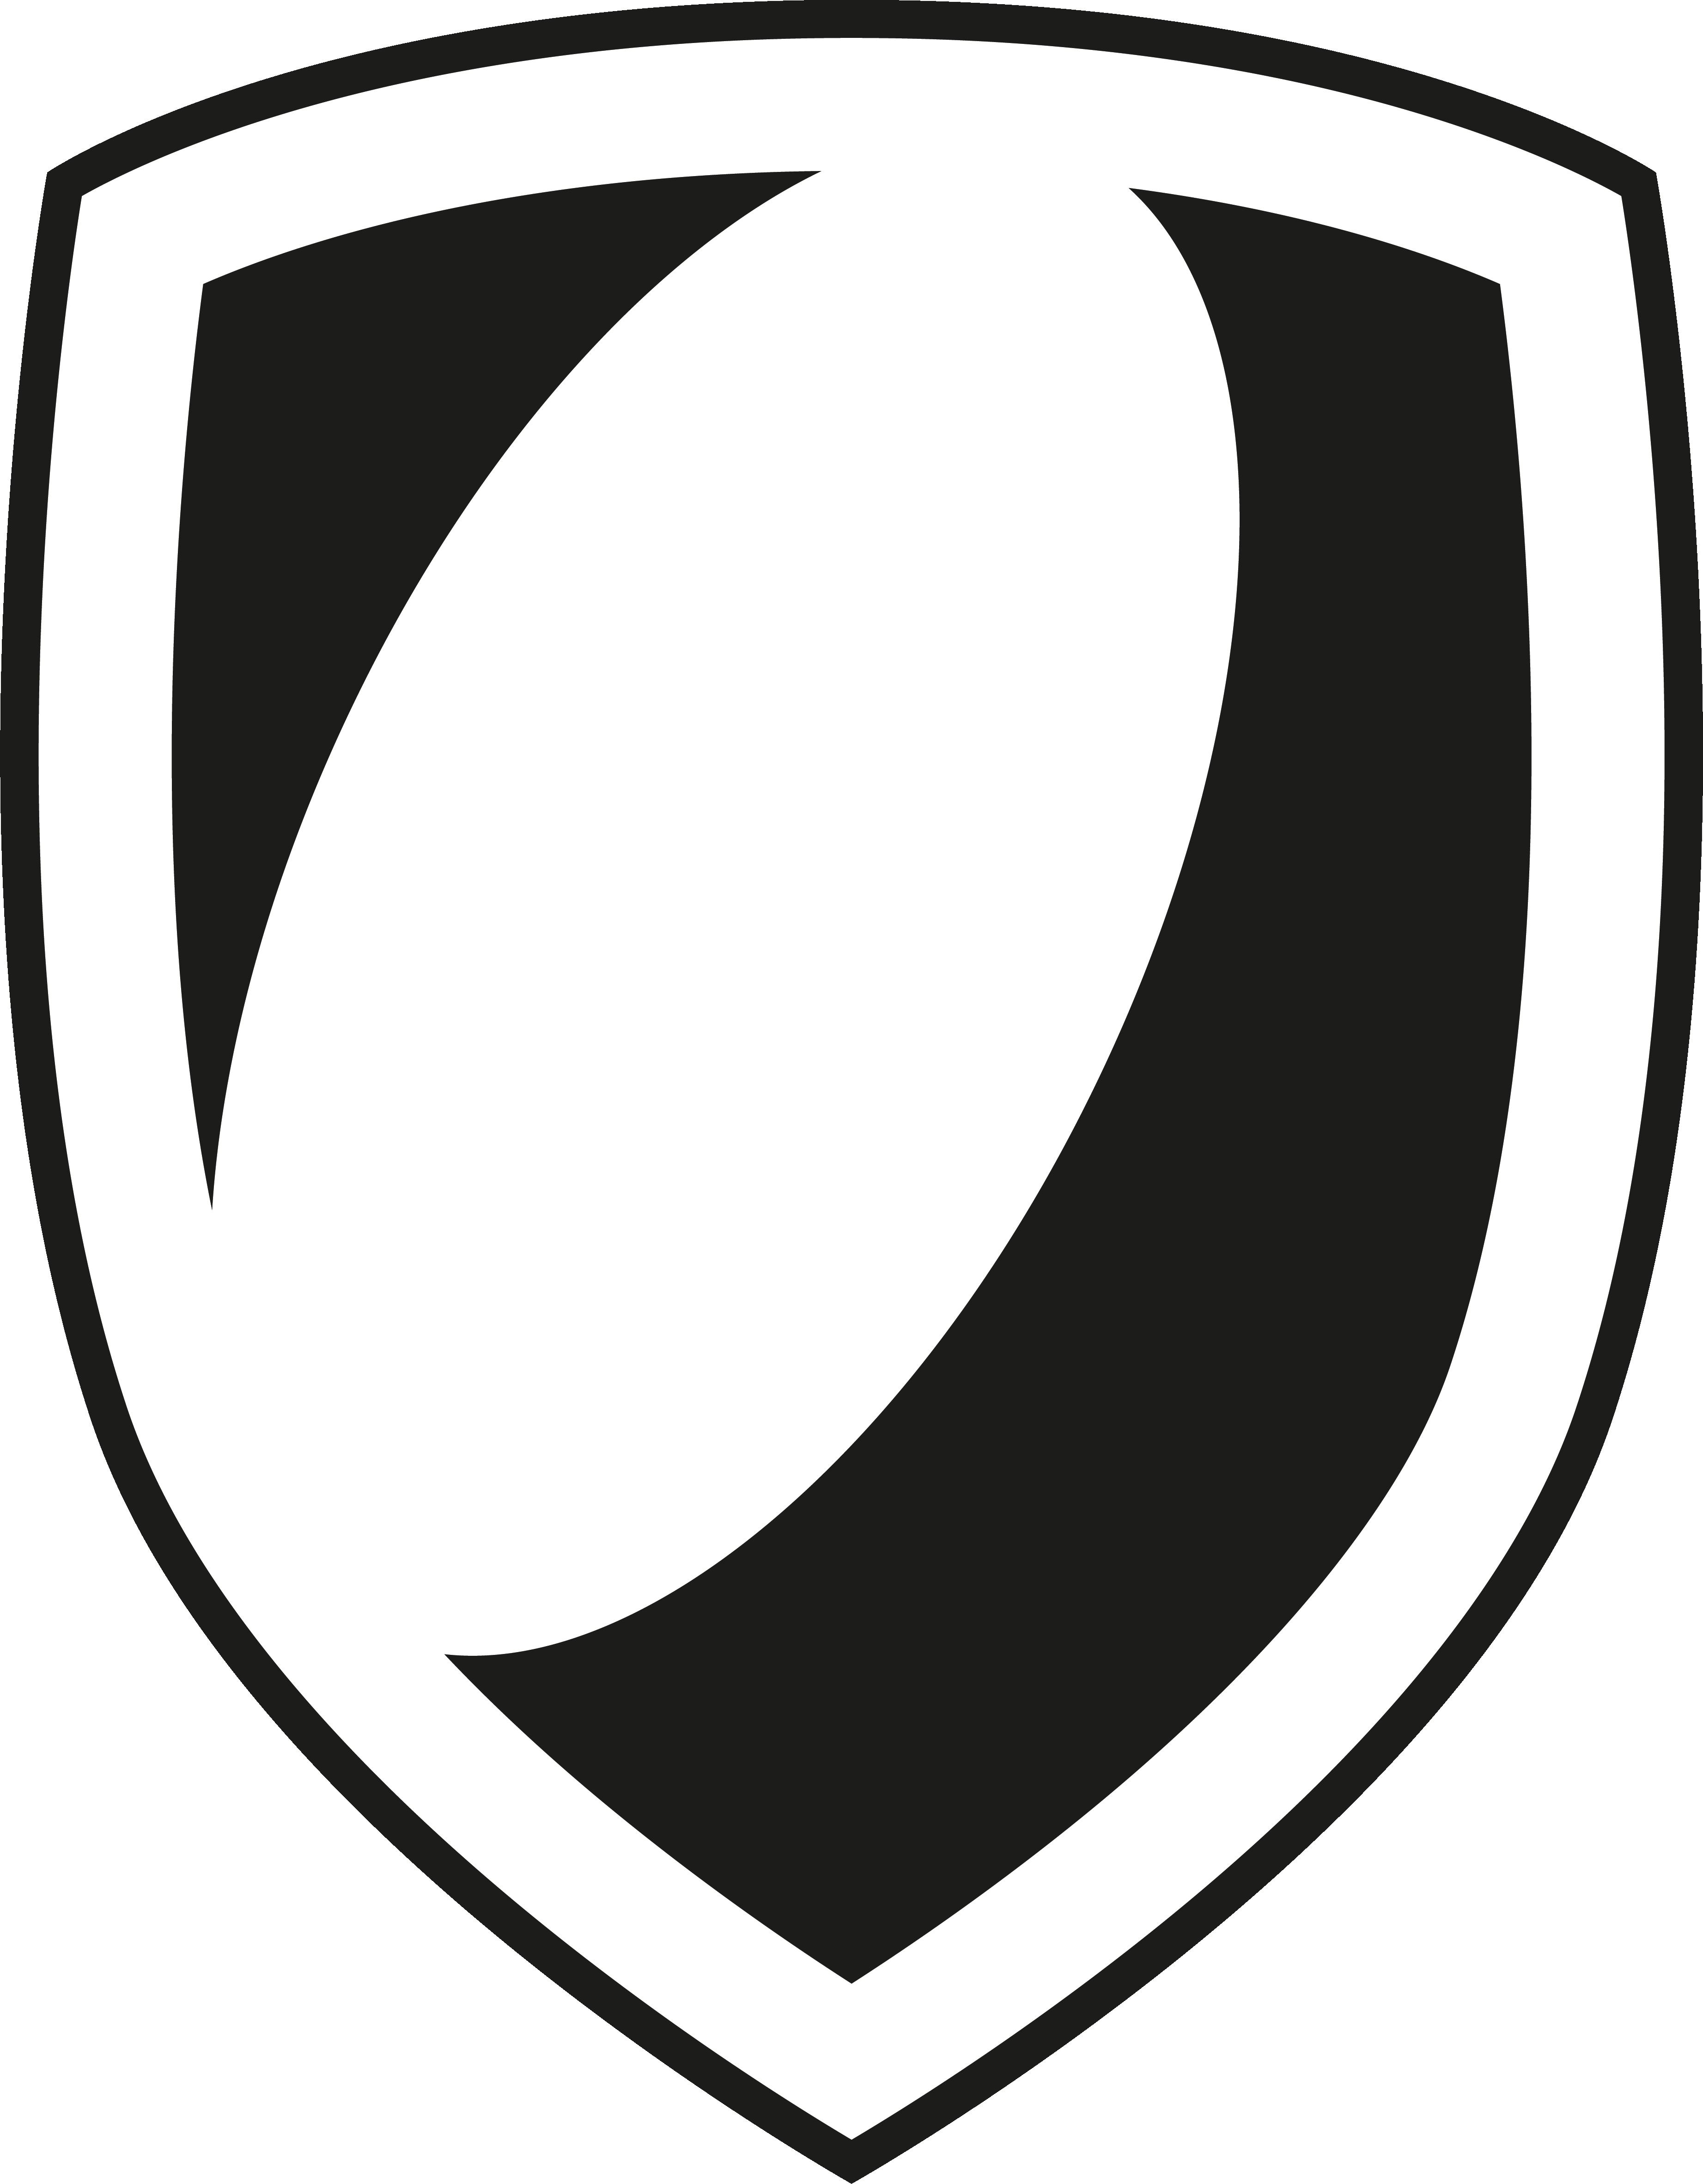 Clip art simple transprent. Clipart shield emblem